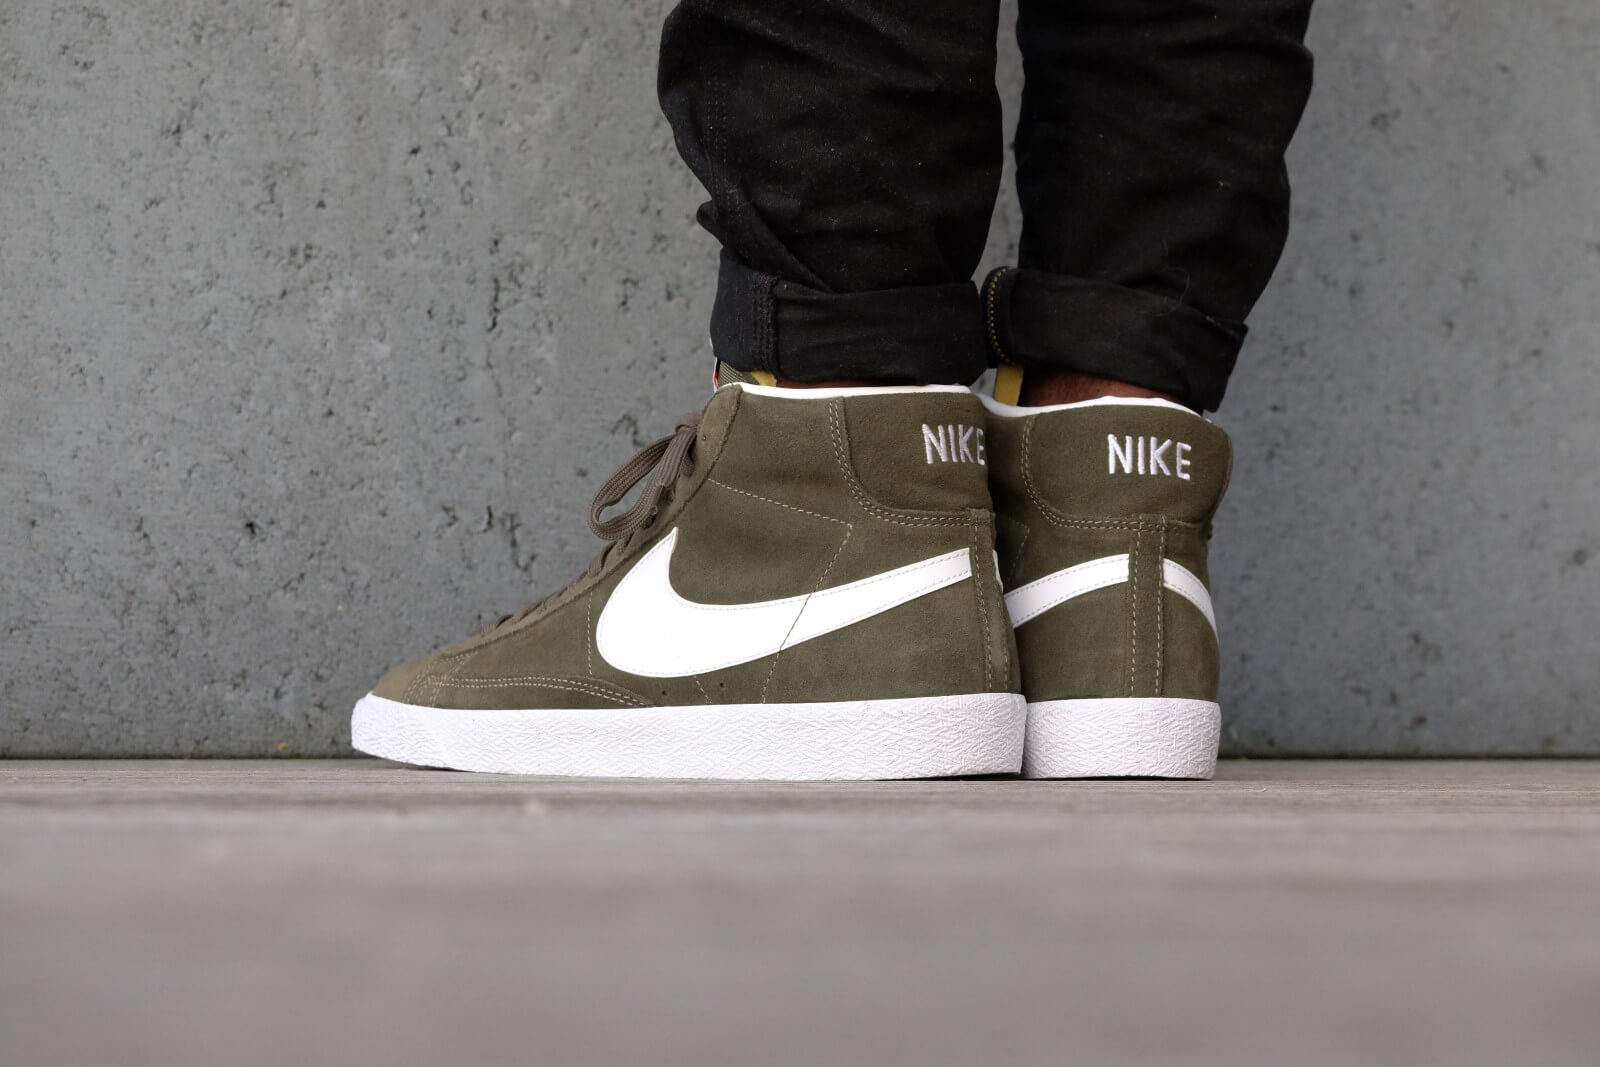 100% authentic 2dd1a c2a9a ... Nike Blazer Mid PRM Urban Haze White - White - Gum Light Brown - 429988  ...